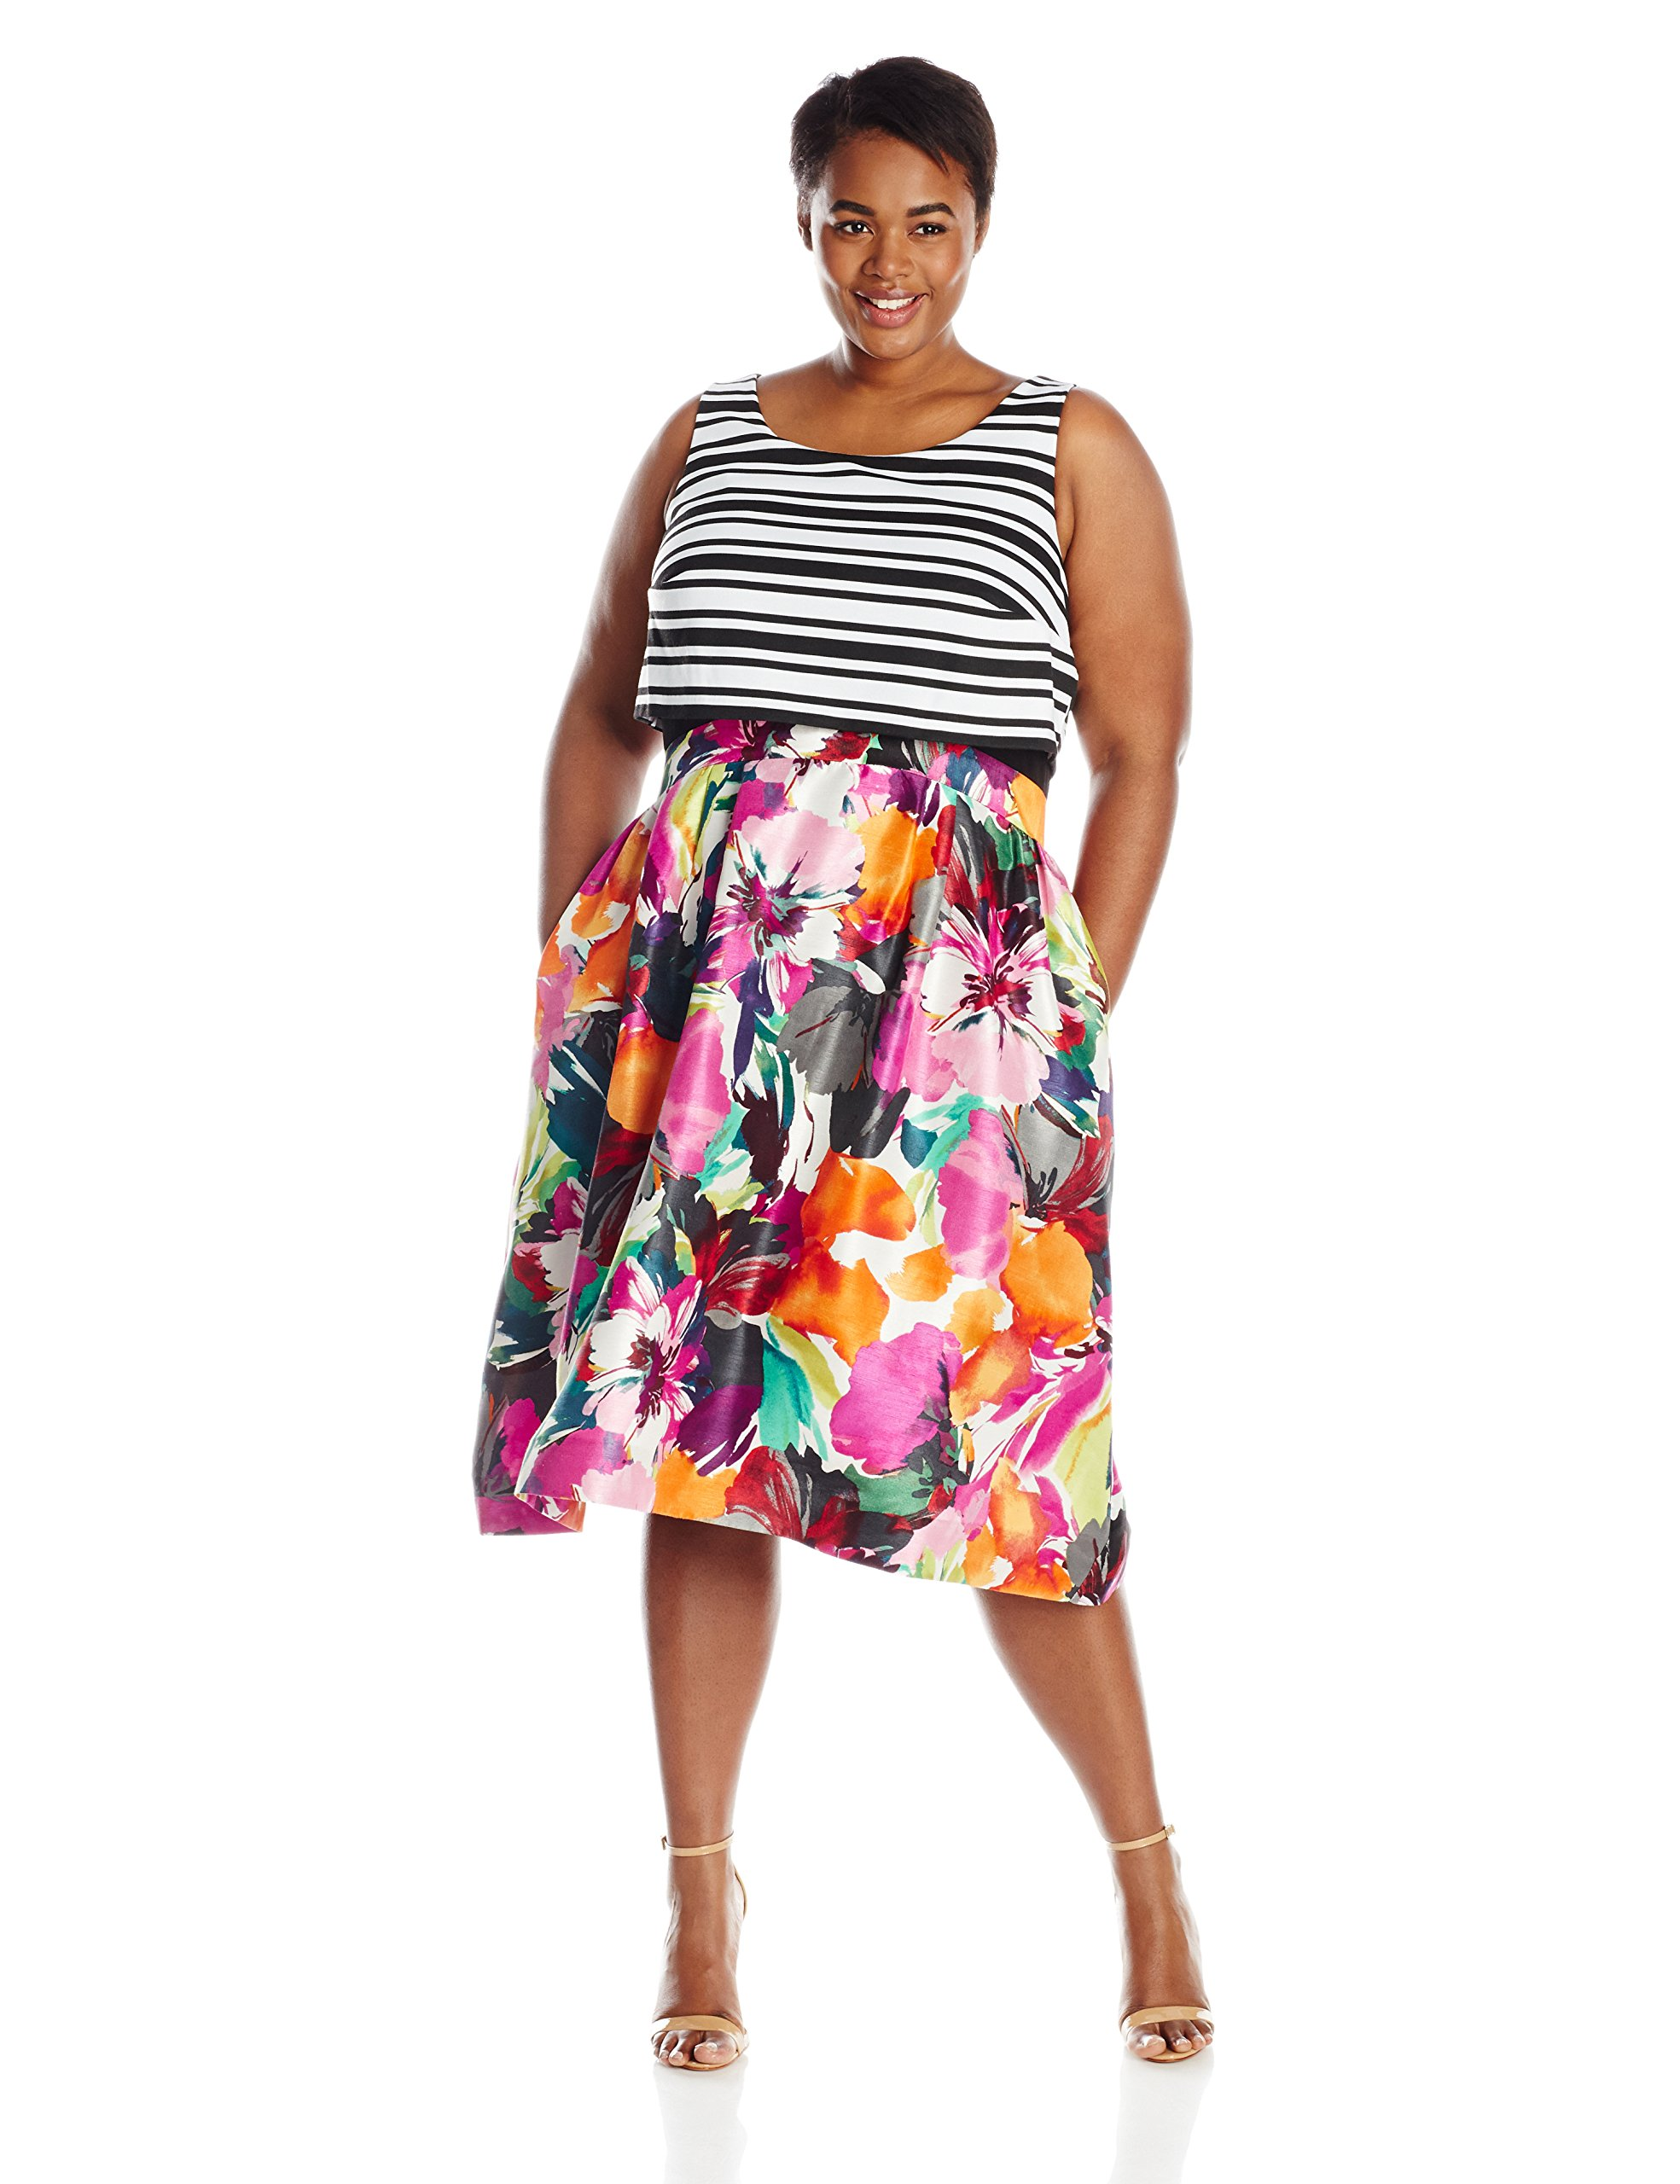 632cedfd2ab Taylor Dresses Women s Plus-Size Popover Midi Dress in Dual Fabric  Black Multicolored Floral